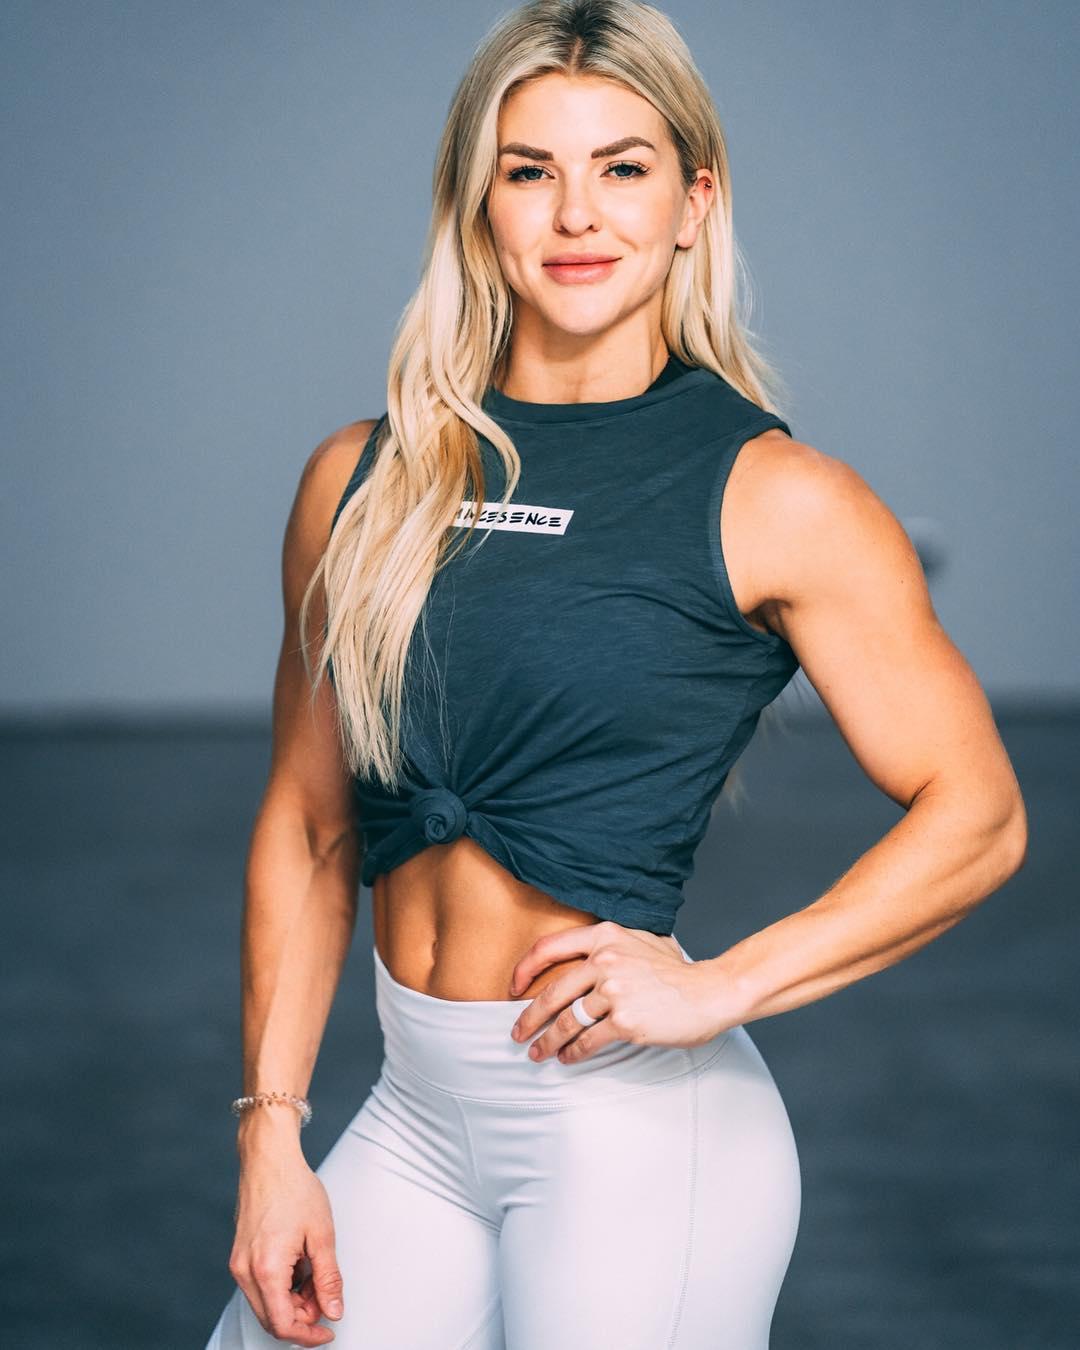 Brooke Holladay Ence Muscles (5 photos 3) - nsfwork.net